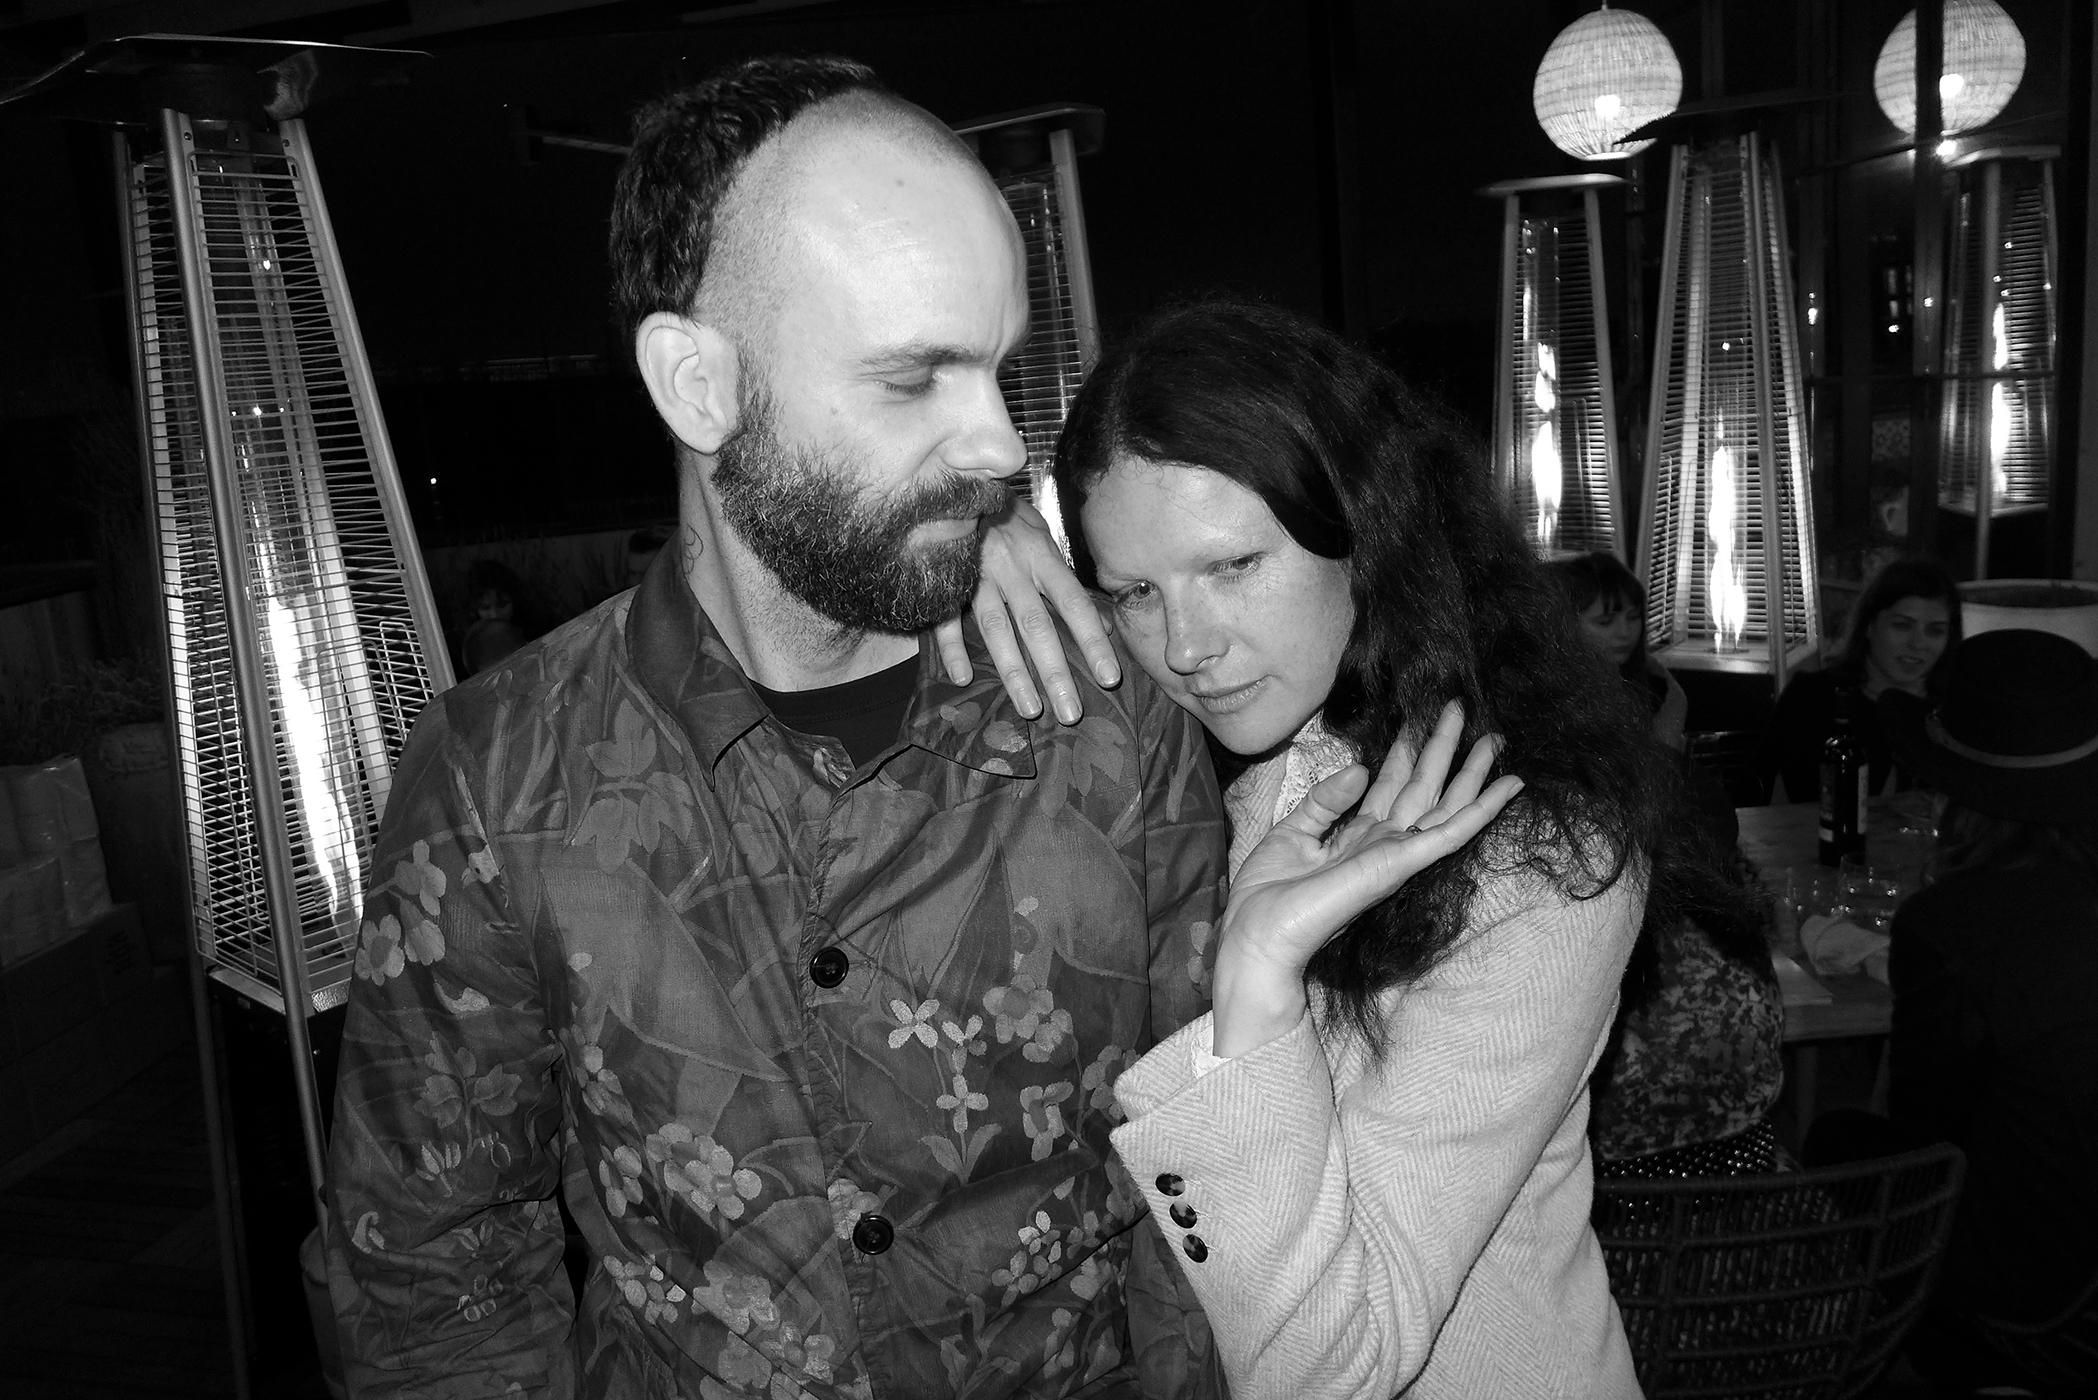 Jon Beasley and Isabelle Albuquerque